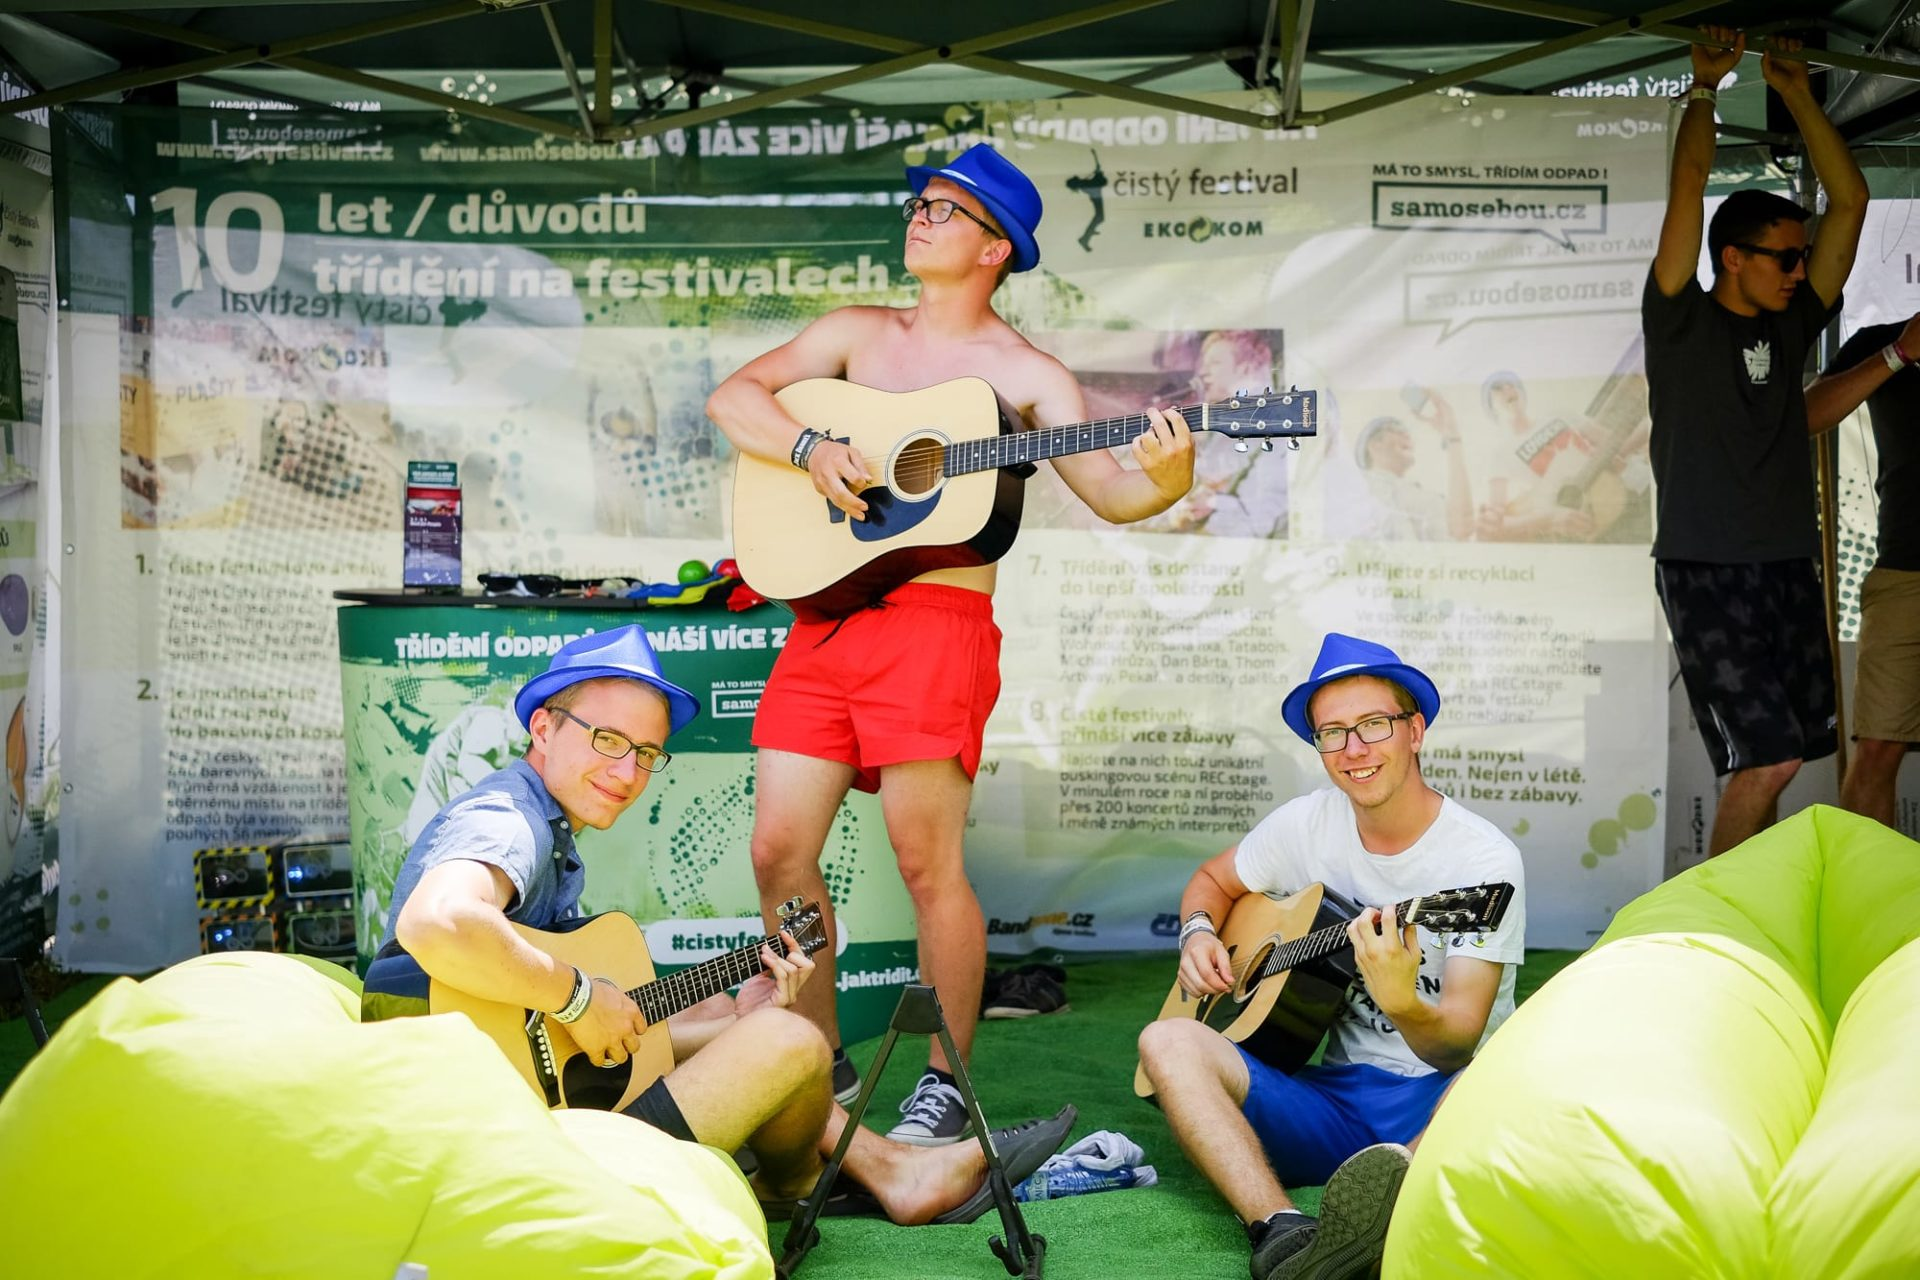 rock_for_people_2017_cisty_festival